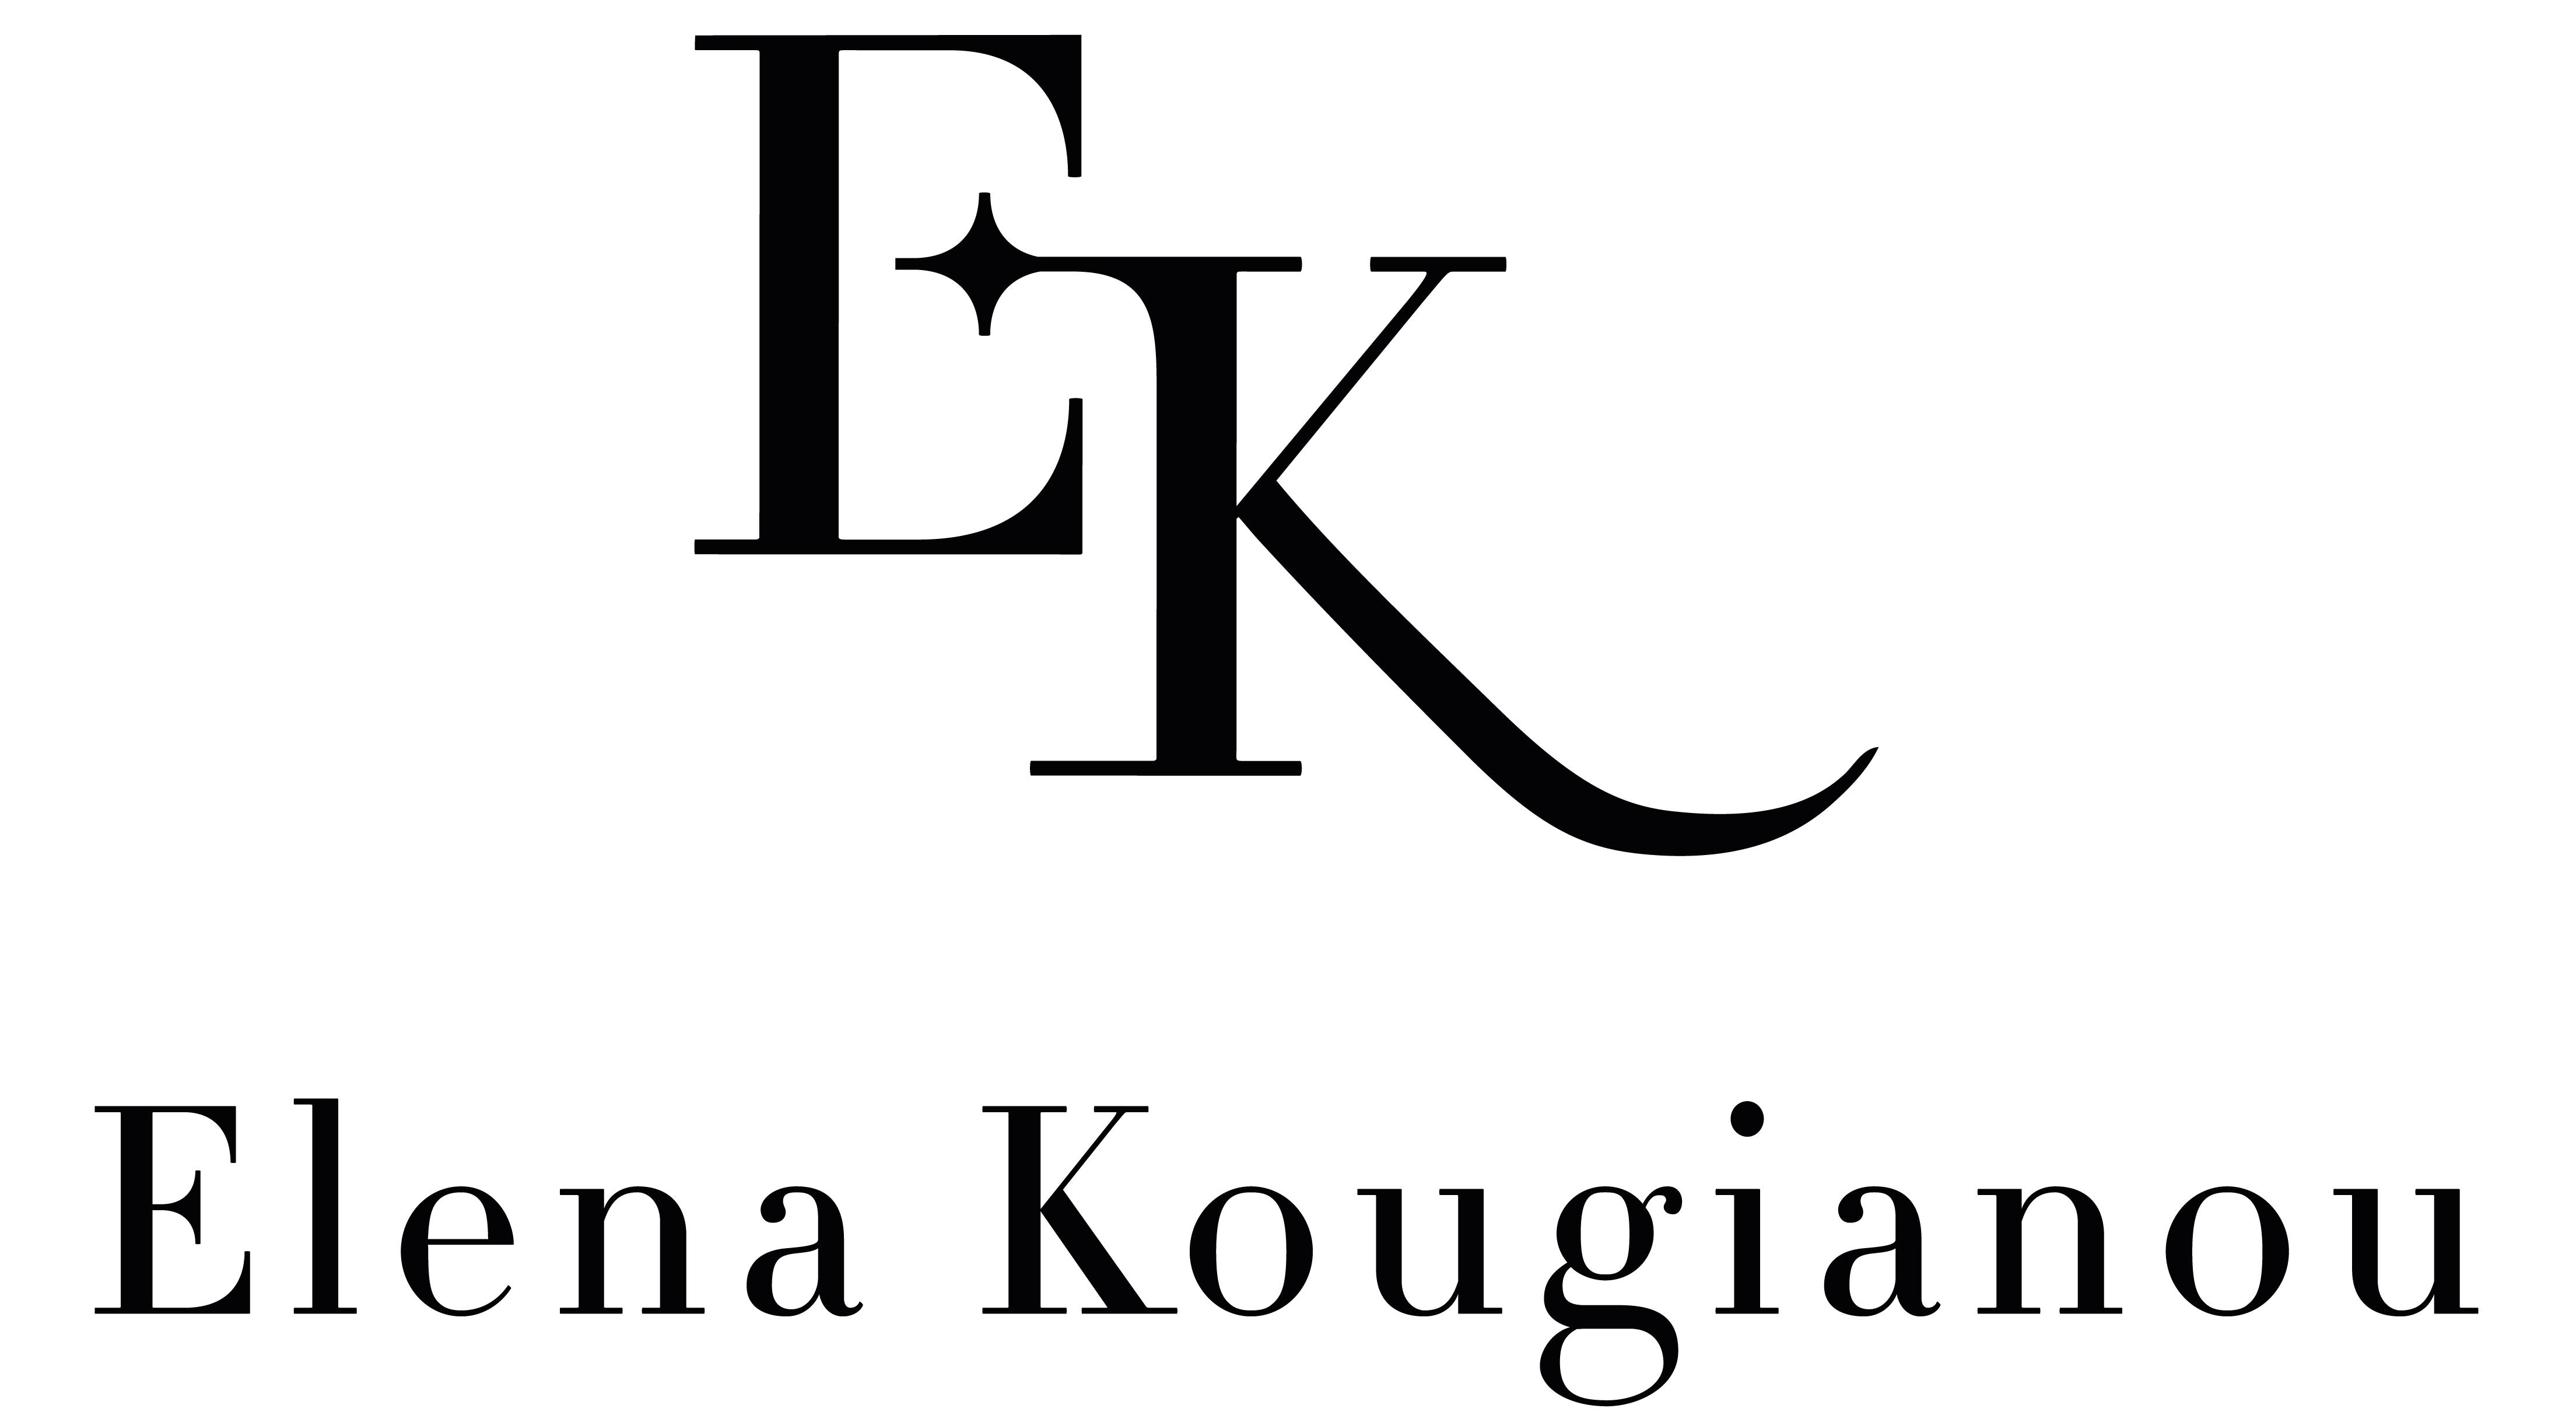 Elena Kougianou